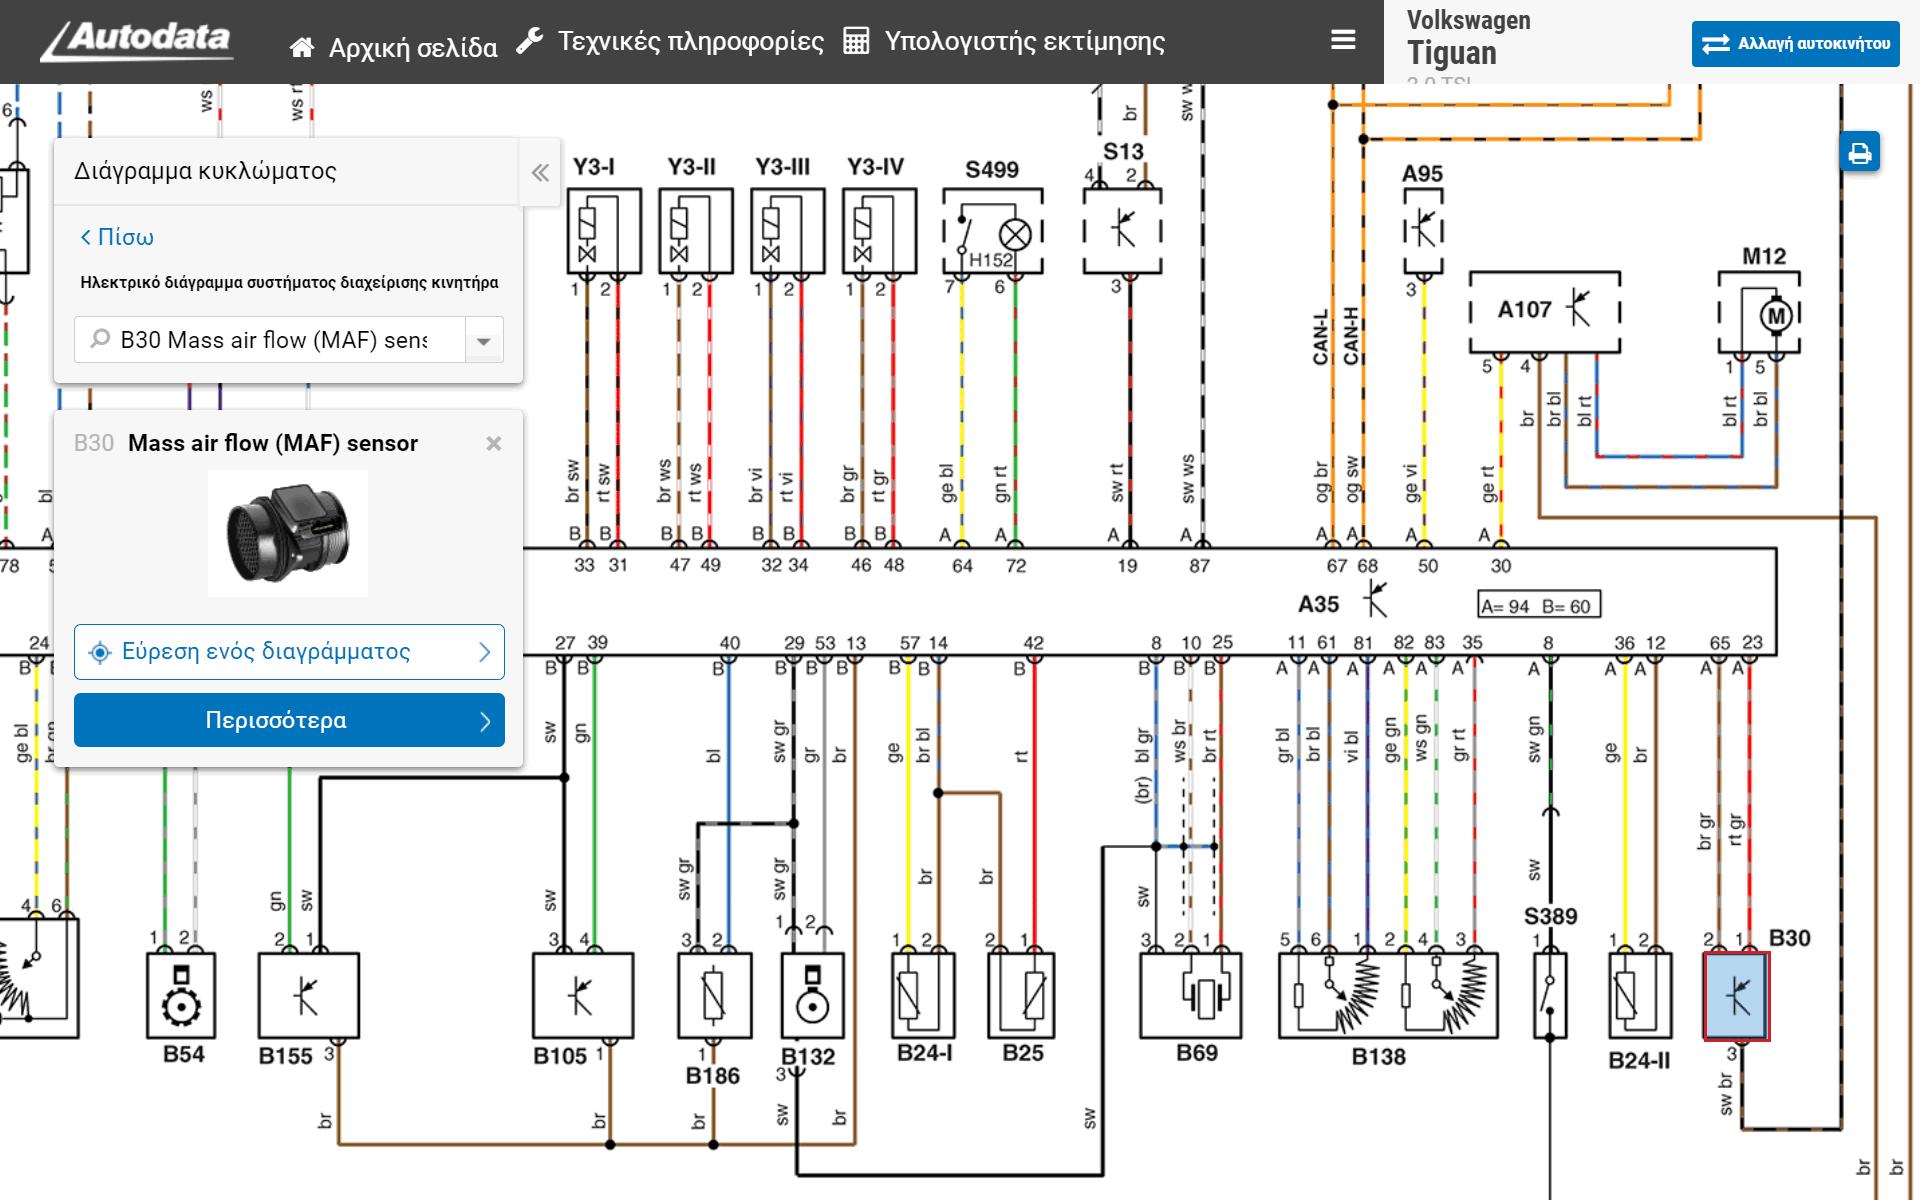 Autodata Τεχνικές πληροφορίες